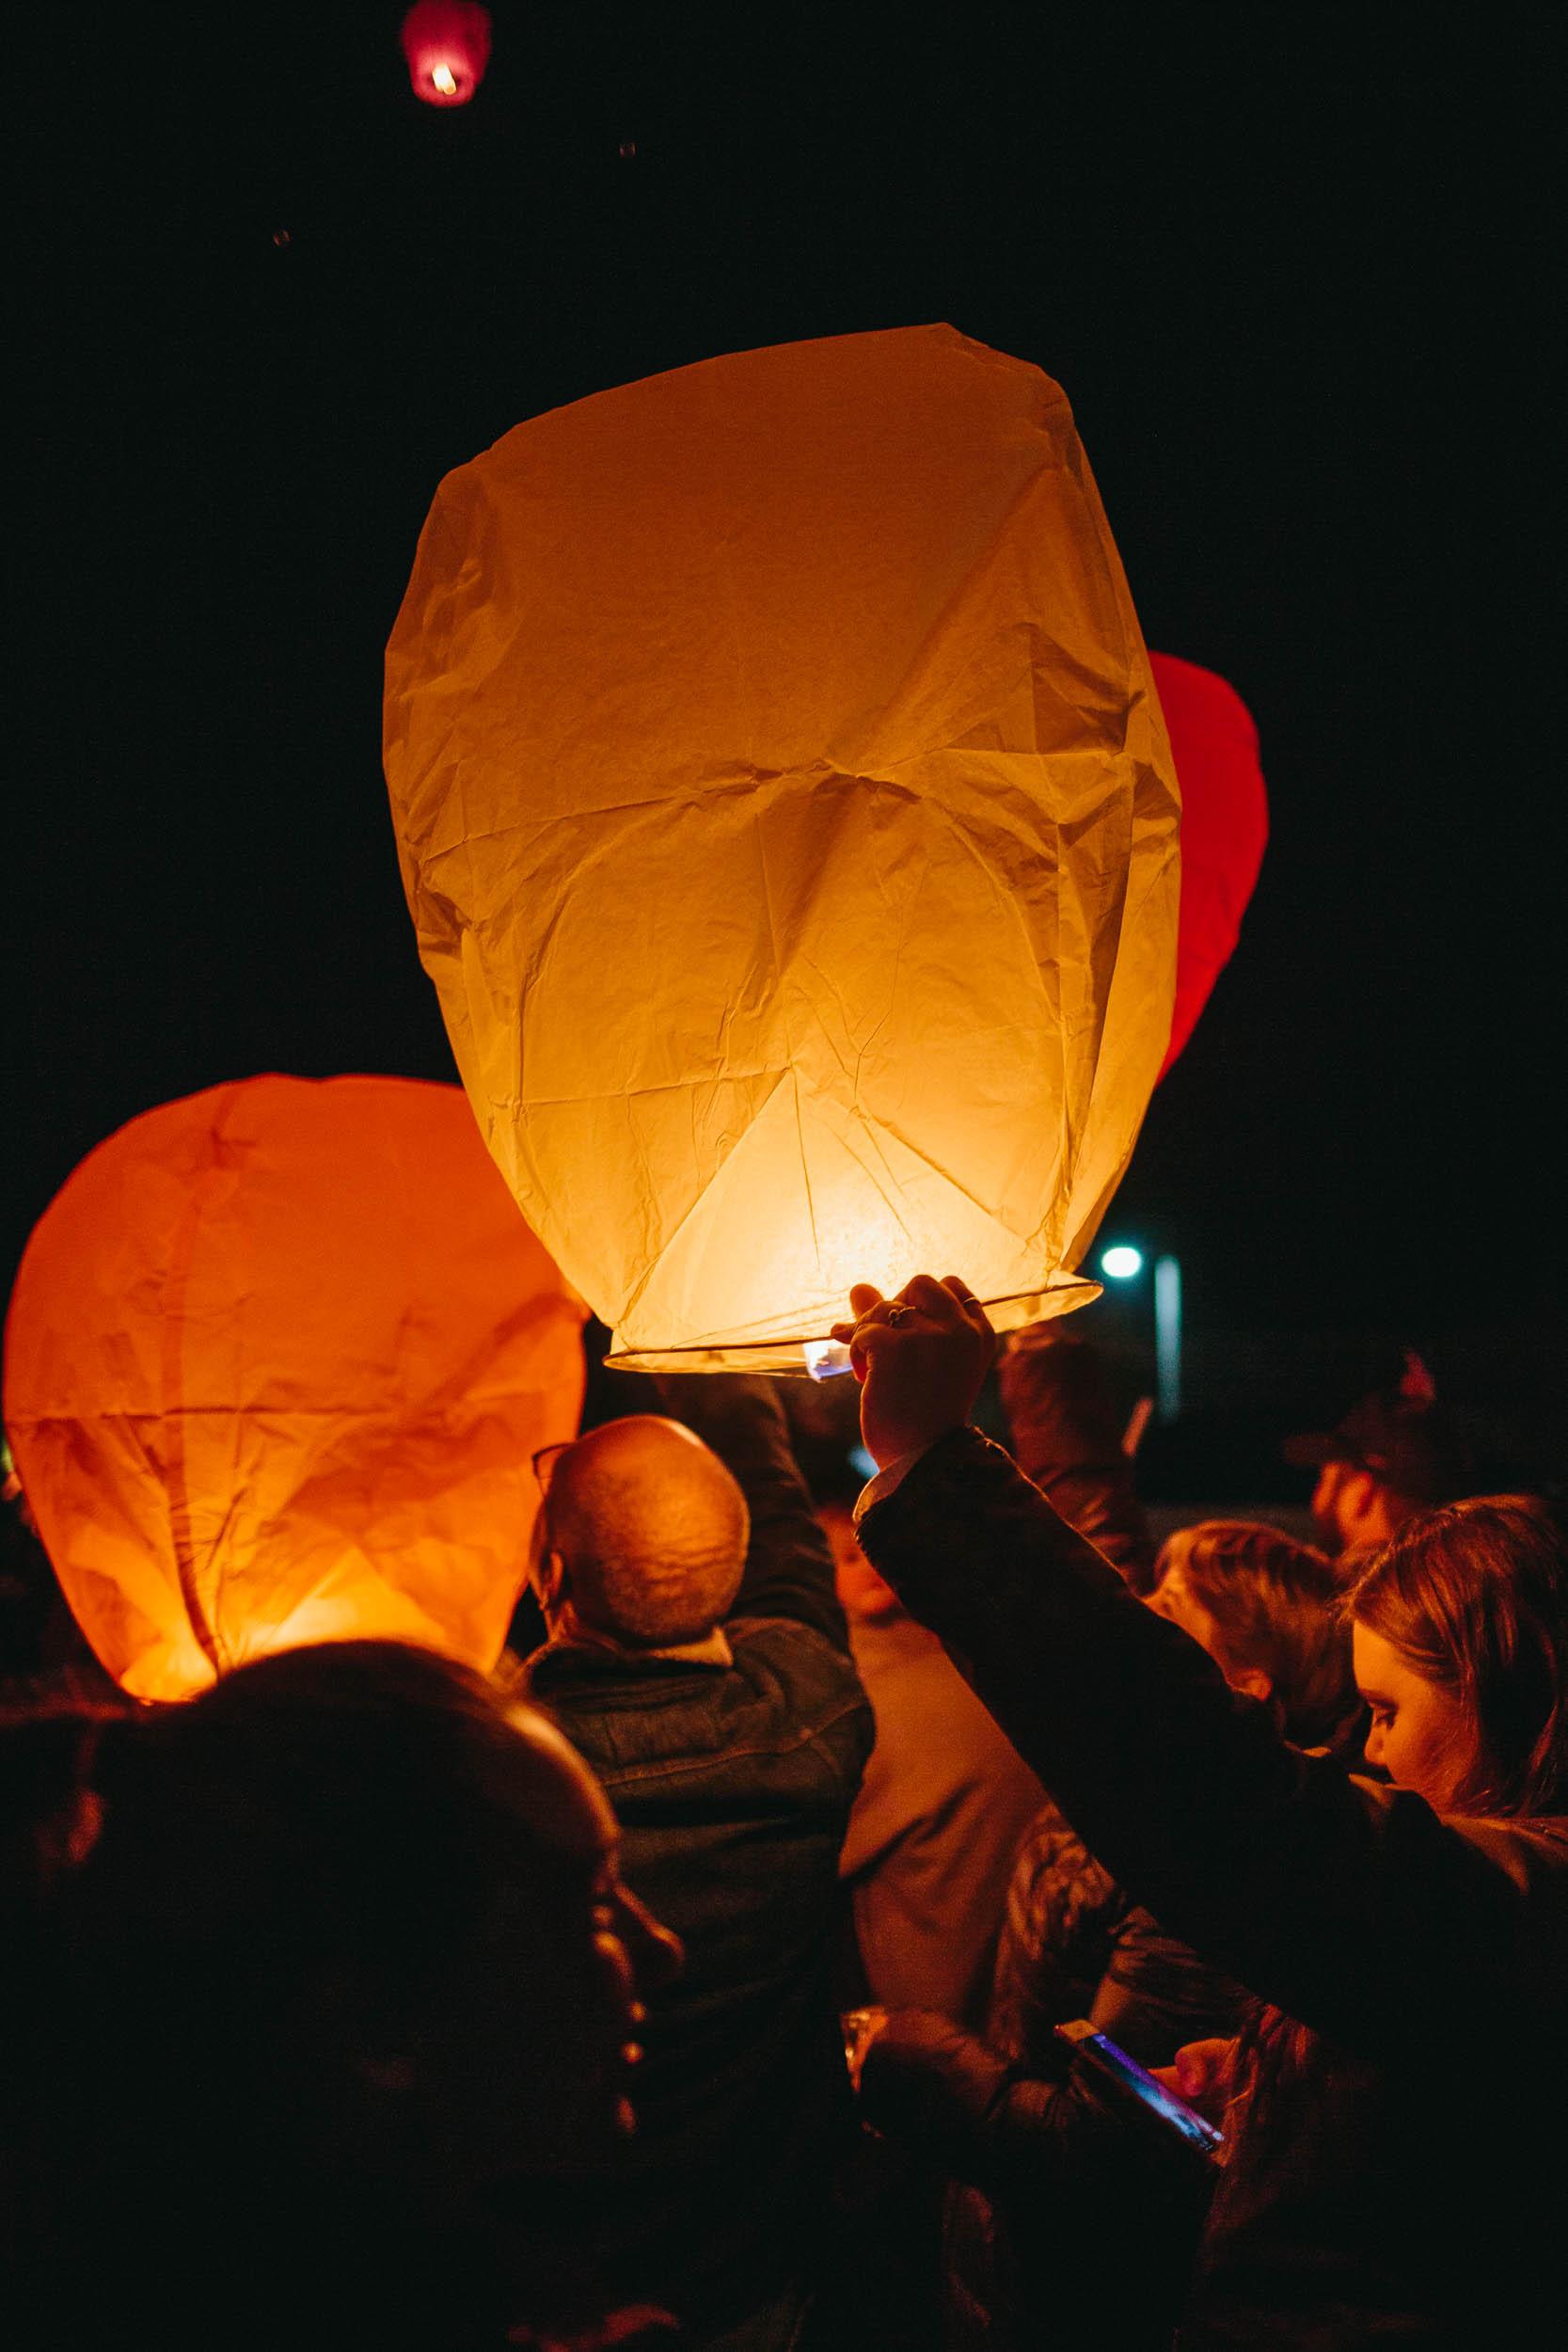 Kyle-Sheppard-Kanab-Balloon-Festival-62.jpg